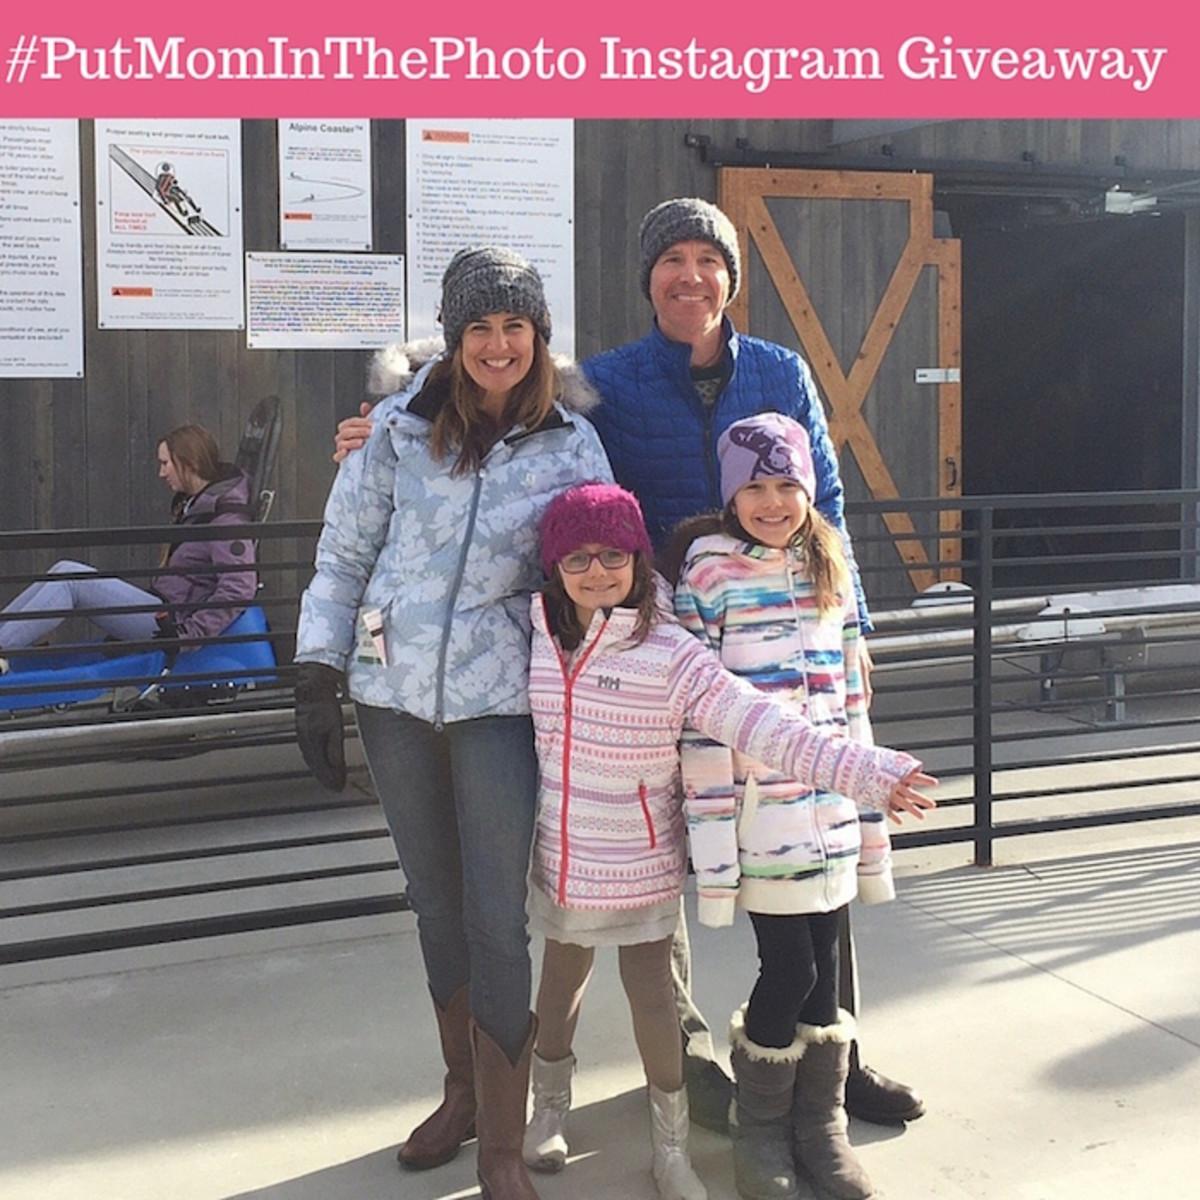 #PutMomInThePhoto Instagram Giveaway